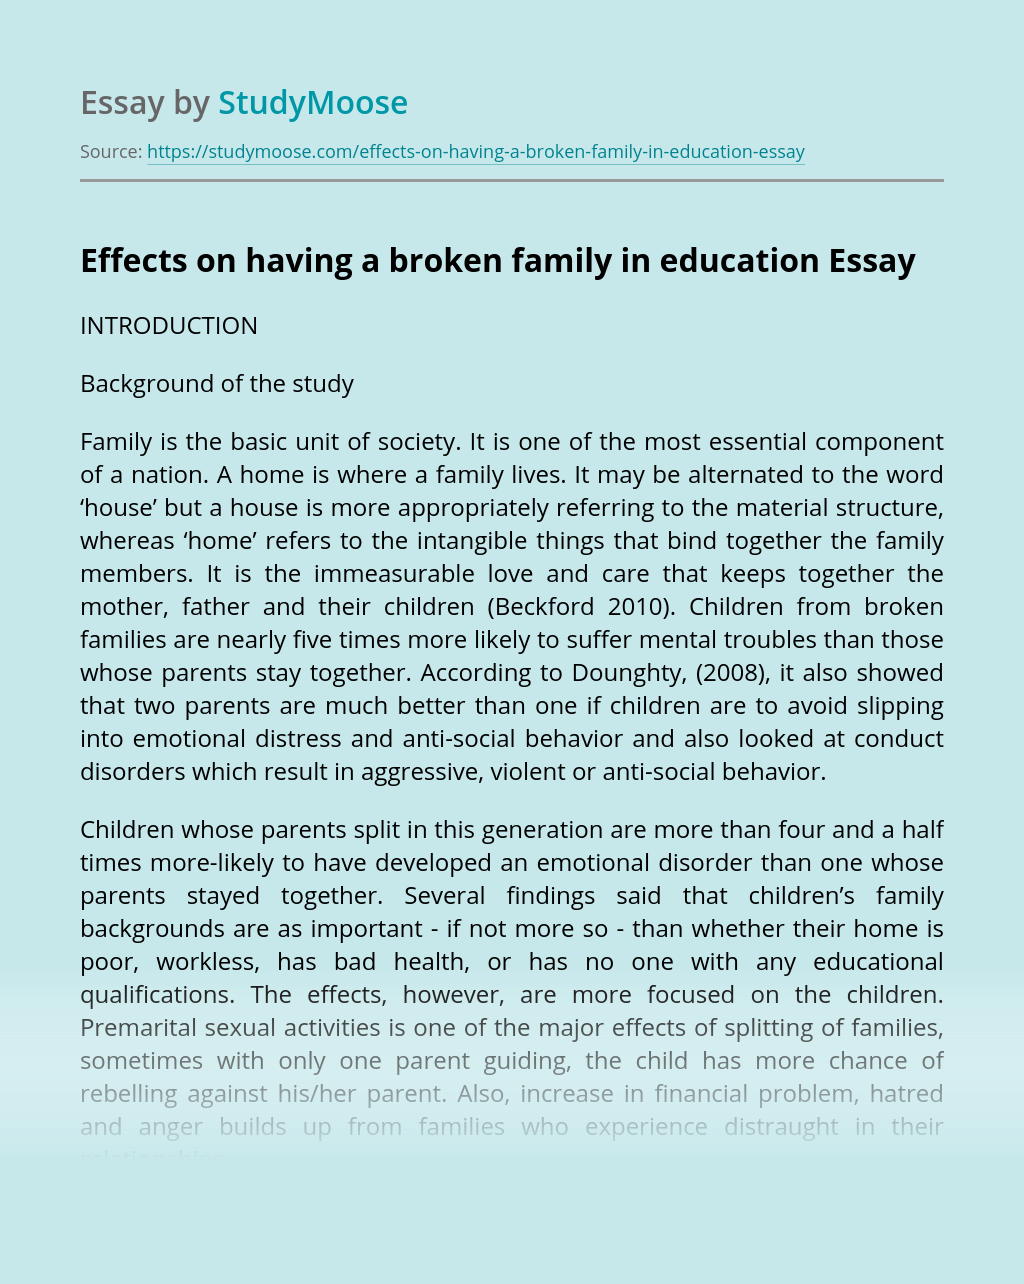 Effects on having a broken family in education